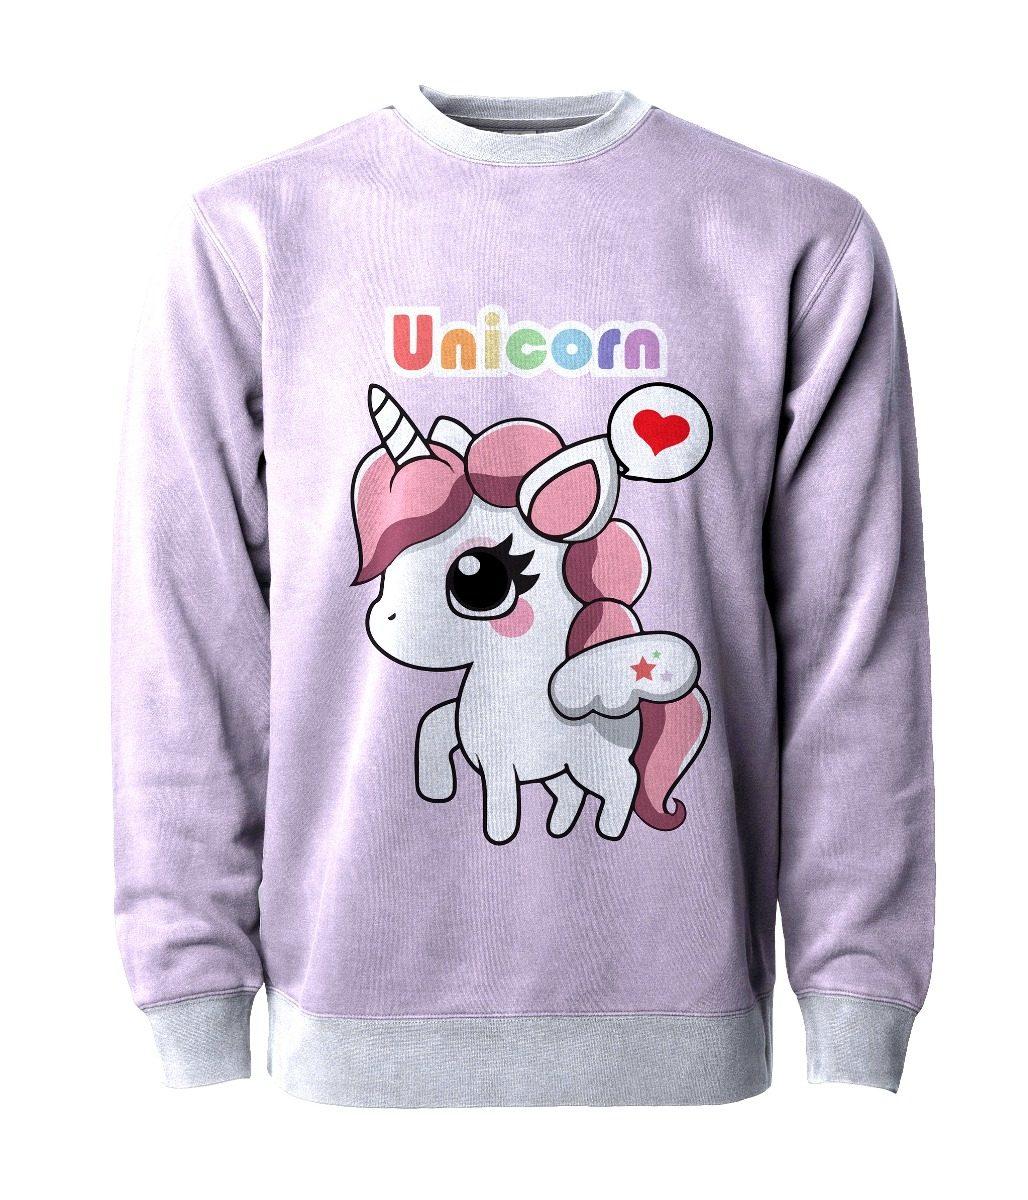 b2993c12e casaco blusa moletom unicornio fofo fofa kawaii tumblr mt. Carregando zoom.